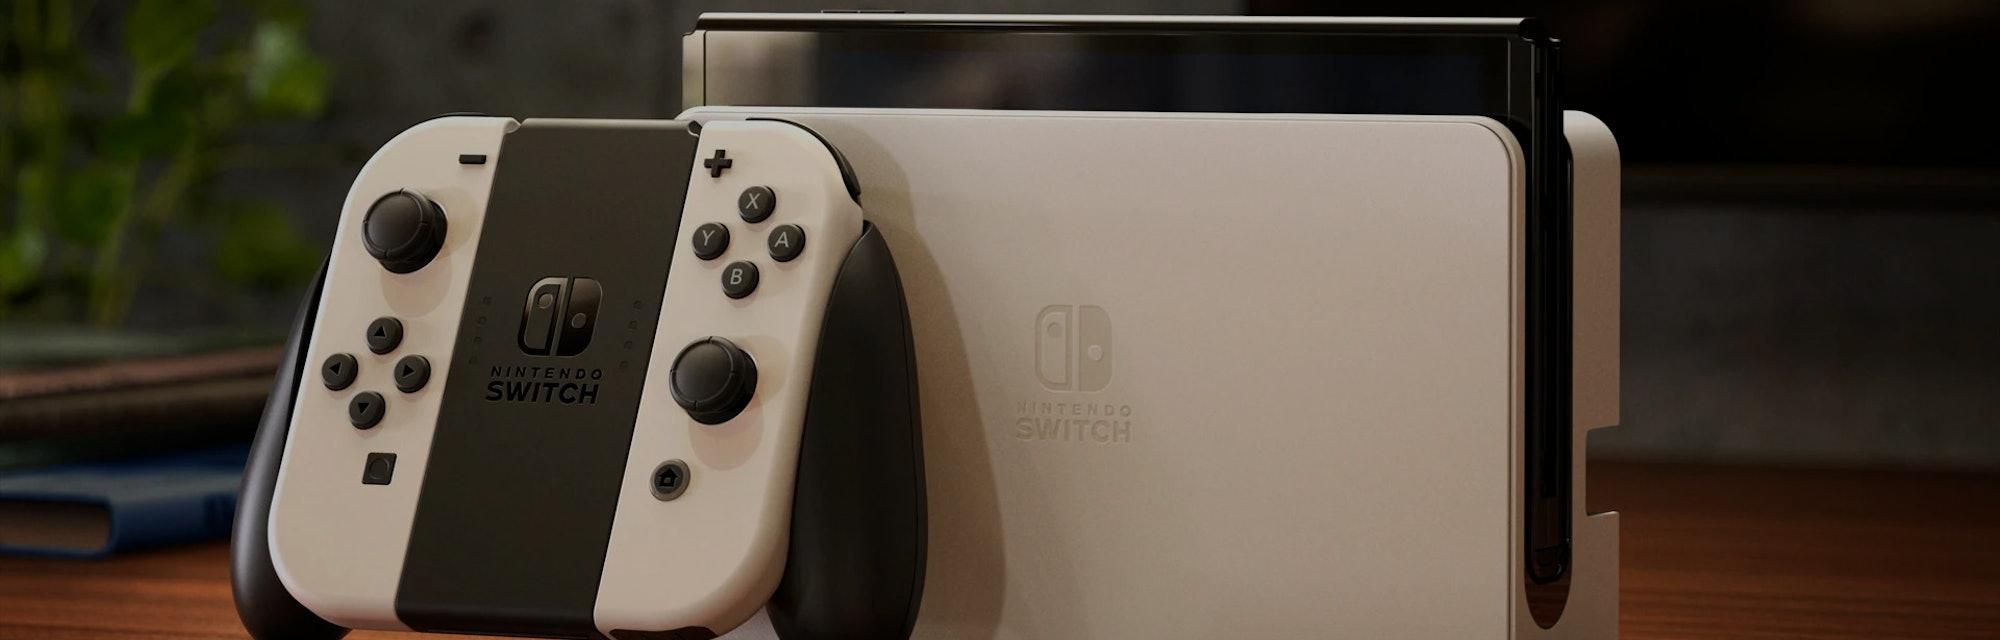 Nintendo Switch OLED model Joy-Con drift issues